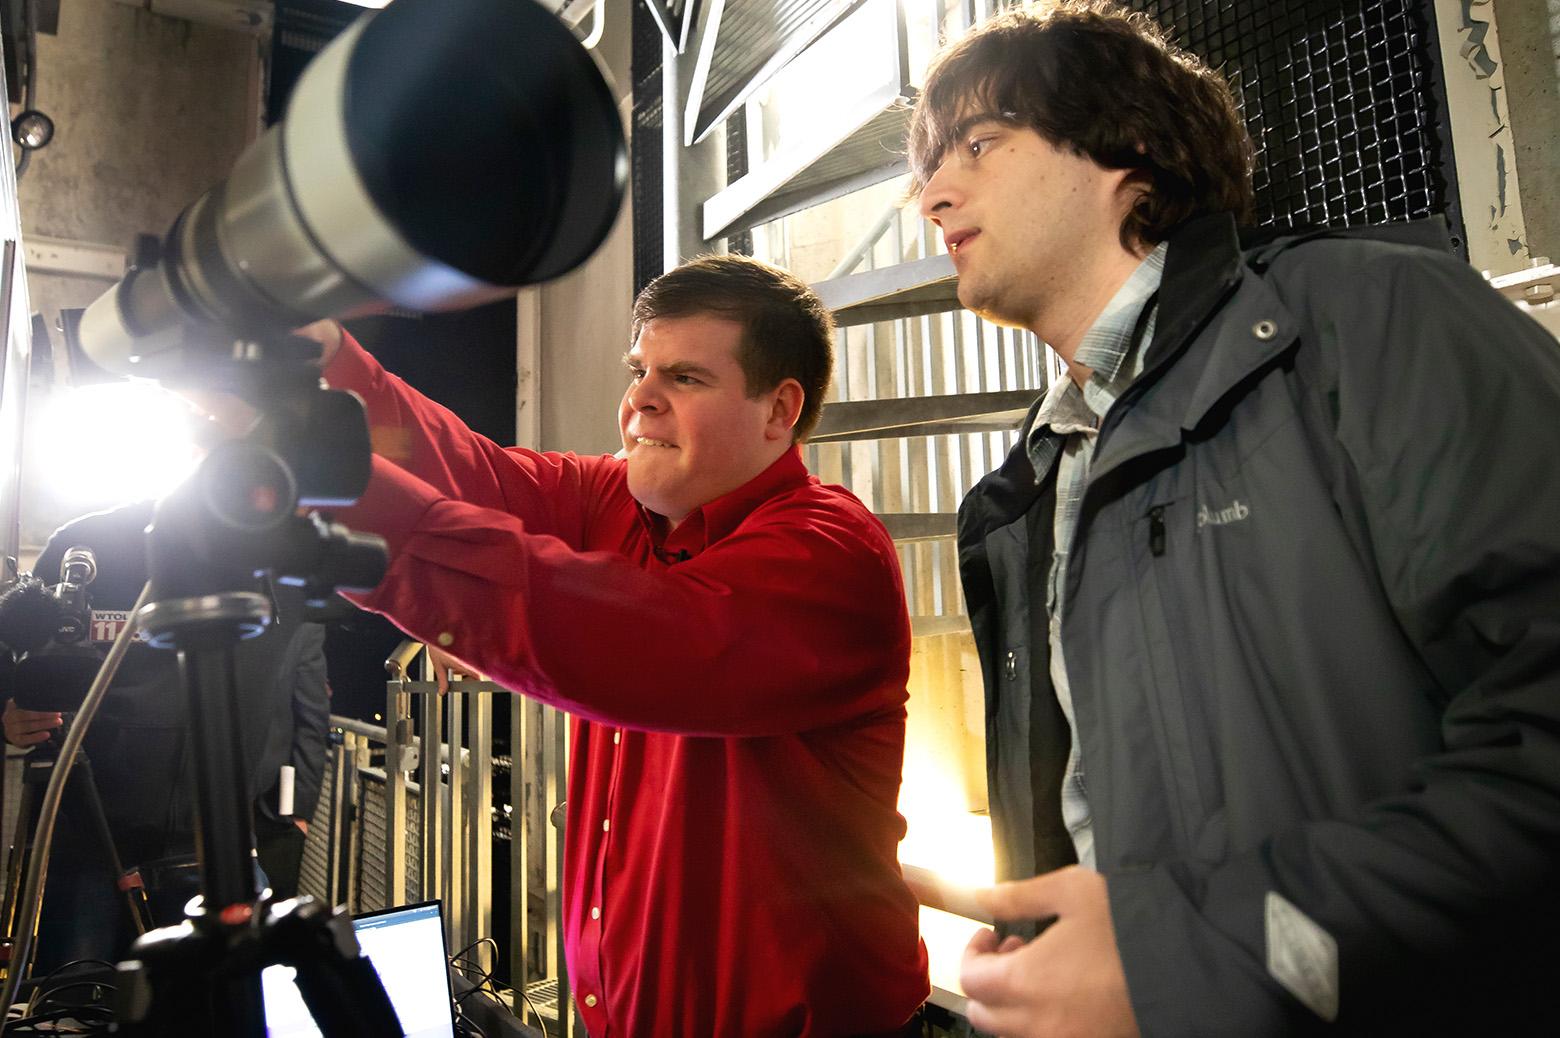 Researchers assembling telescope